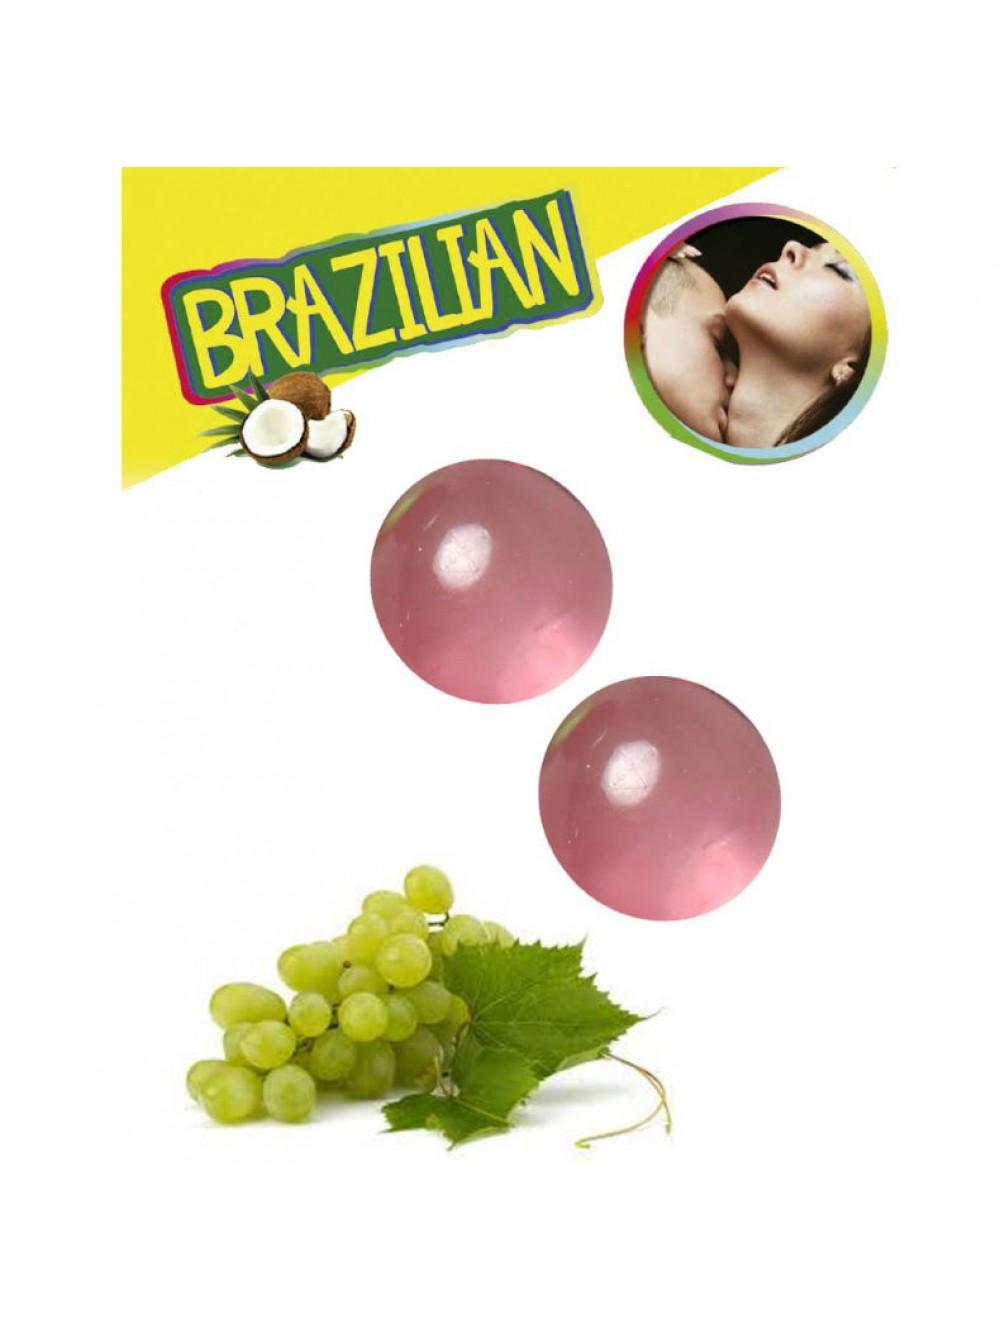 2 BRAZILIAN BALLS GRAPE 8435097633855